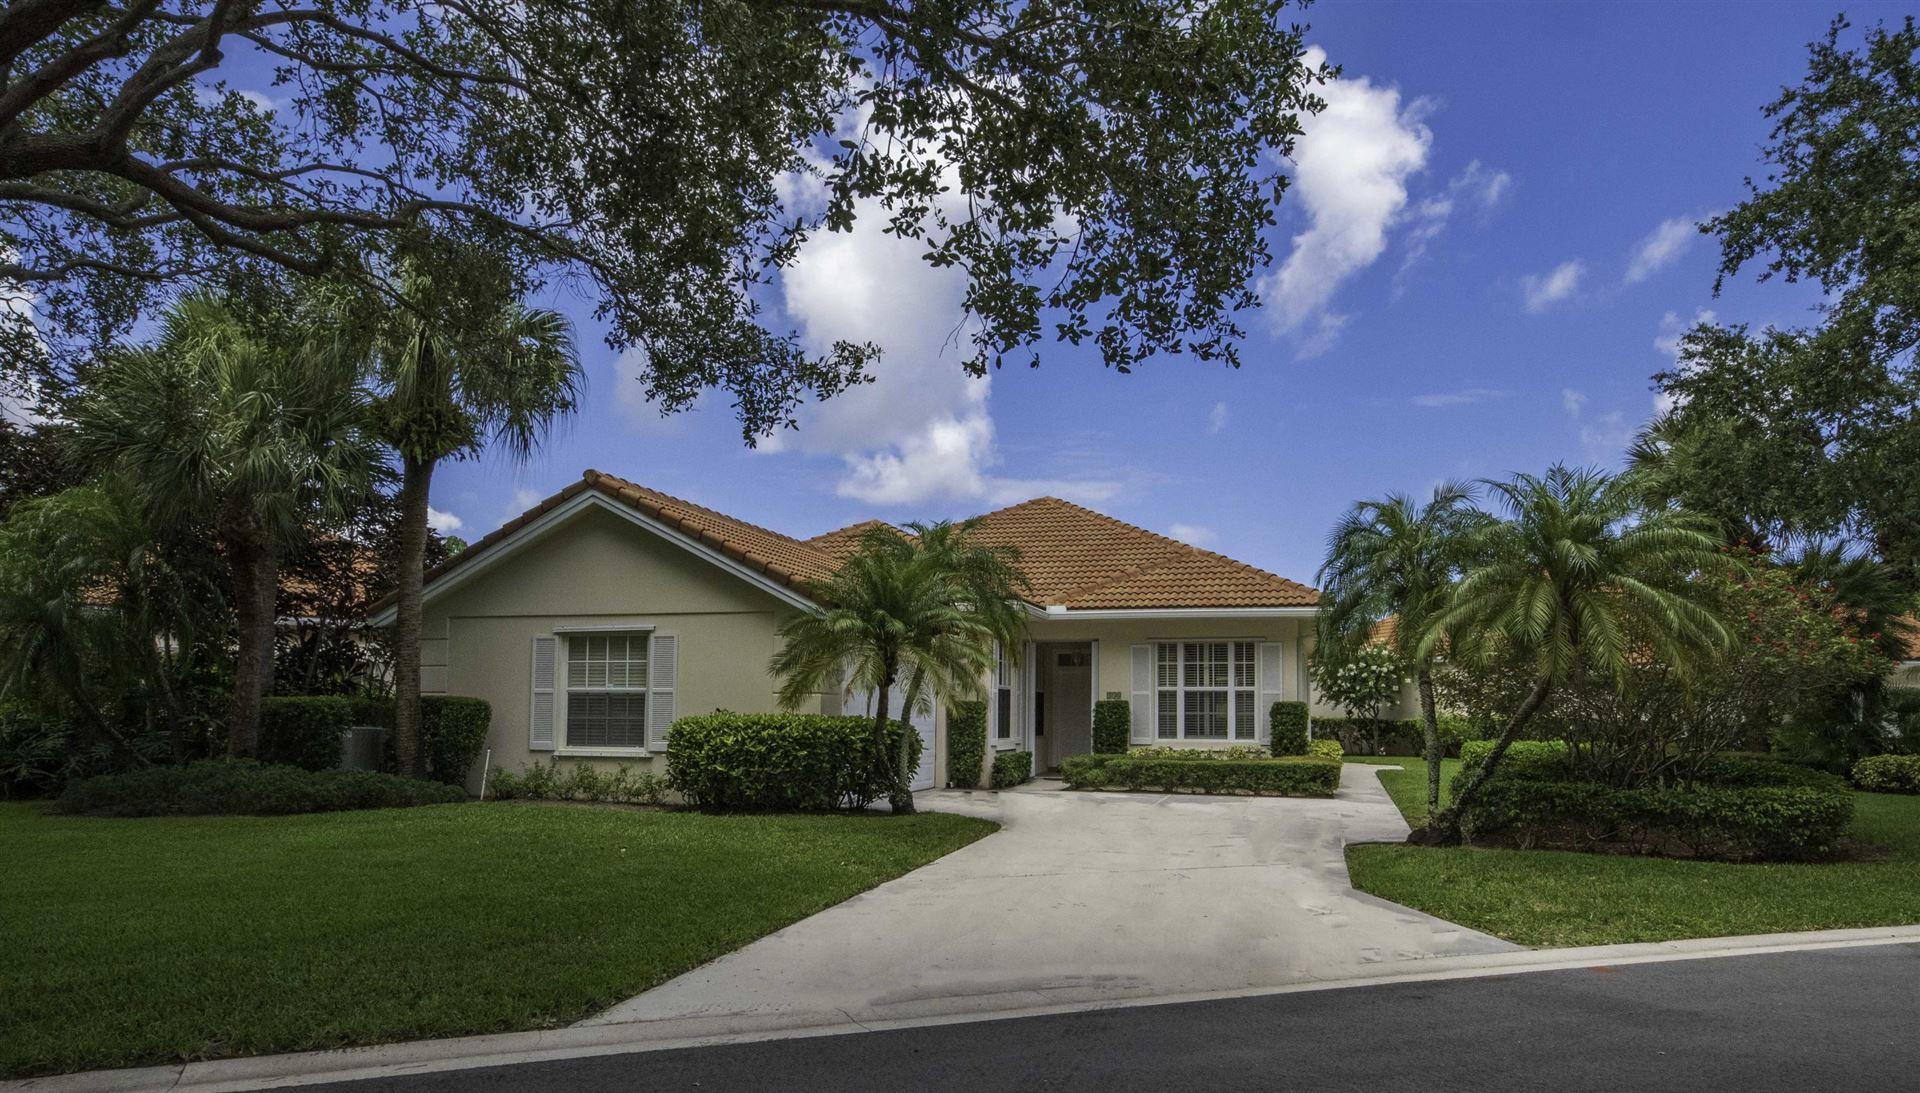 338 Kelsey Park Circle, Palm Beach Gardens, FL 33410 - #: RX-10630460